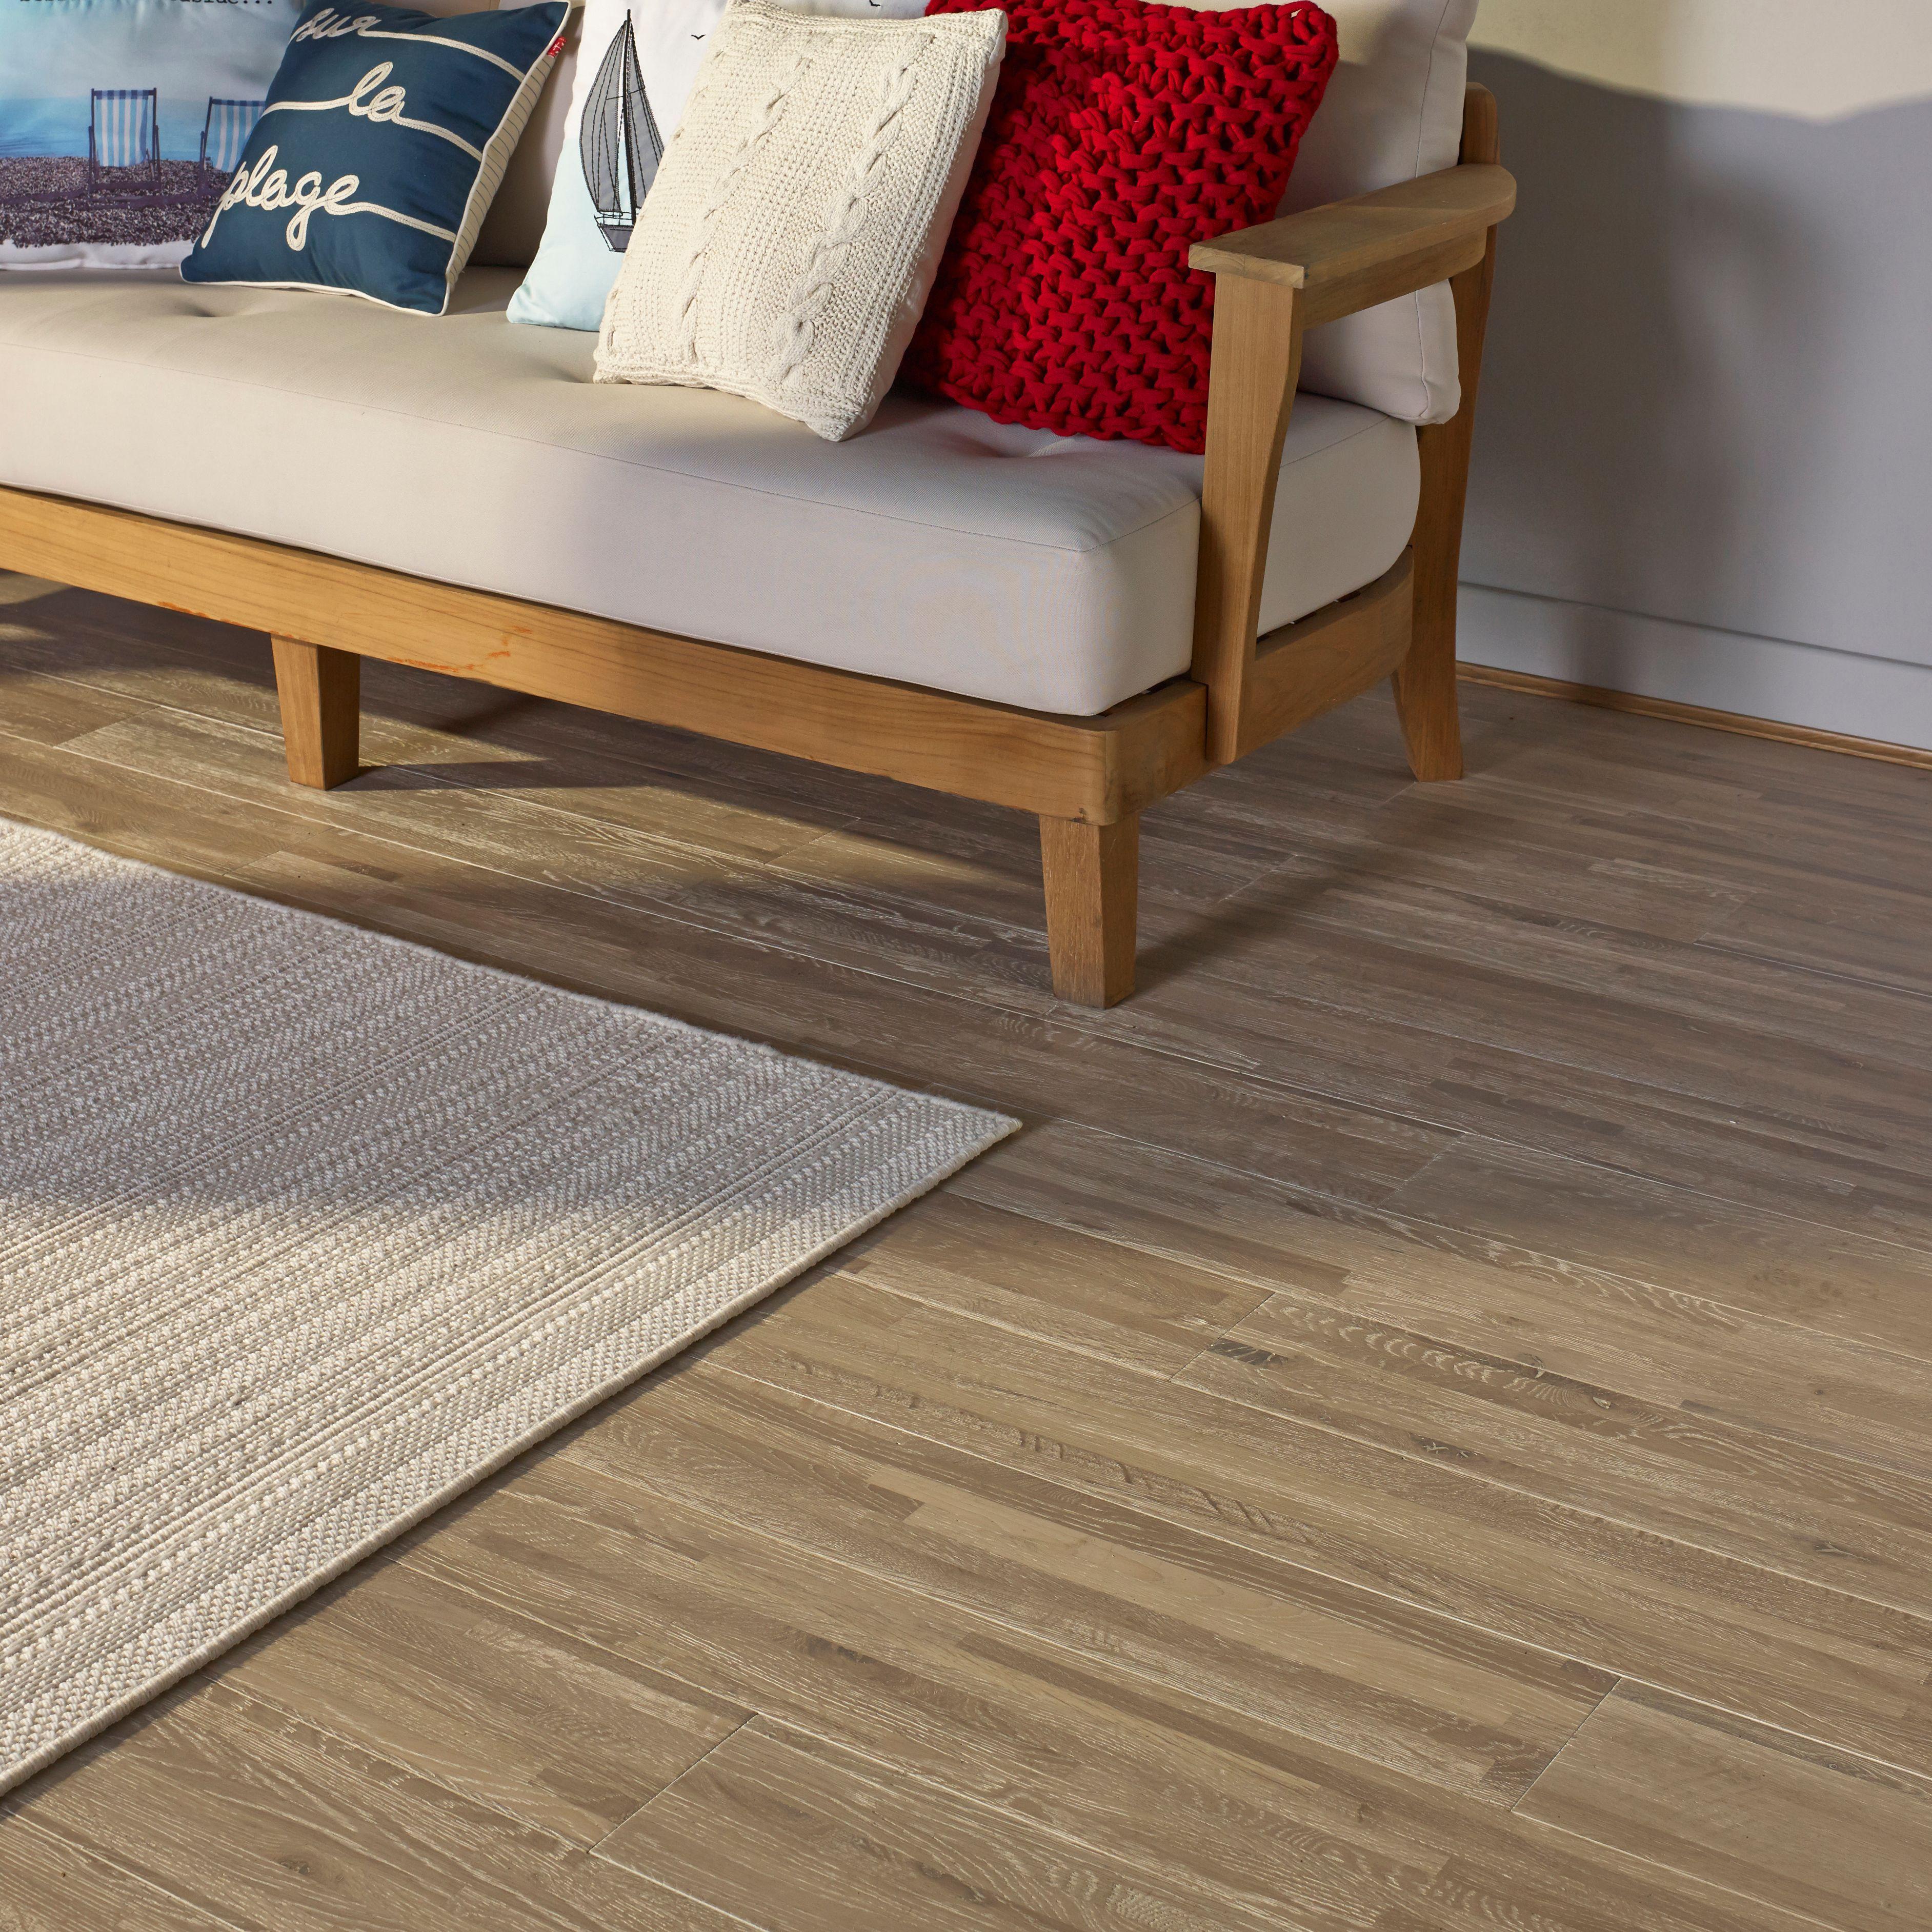 bq hardwood flooring of paul gray paulkinrossgray on pinterest pertaining to 3296d98e395581556a581d8896b6589a